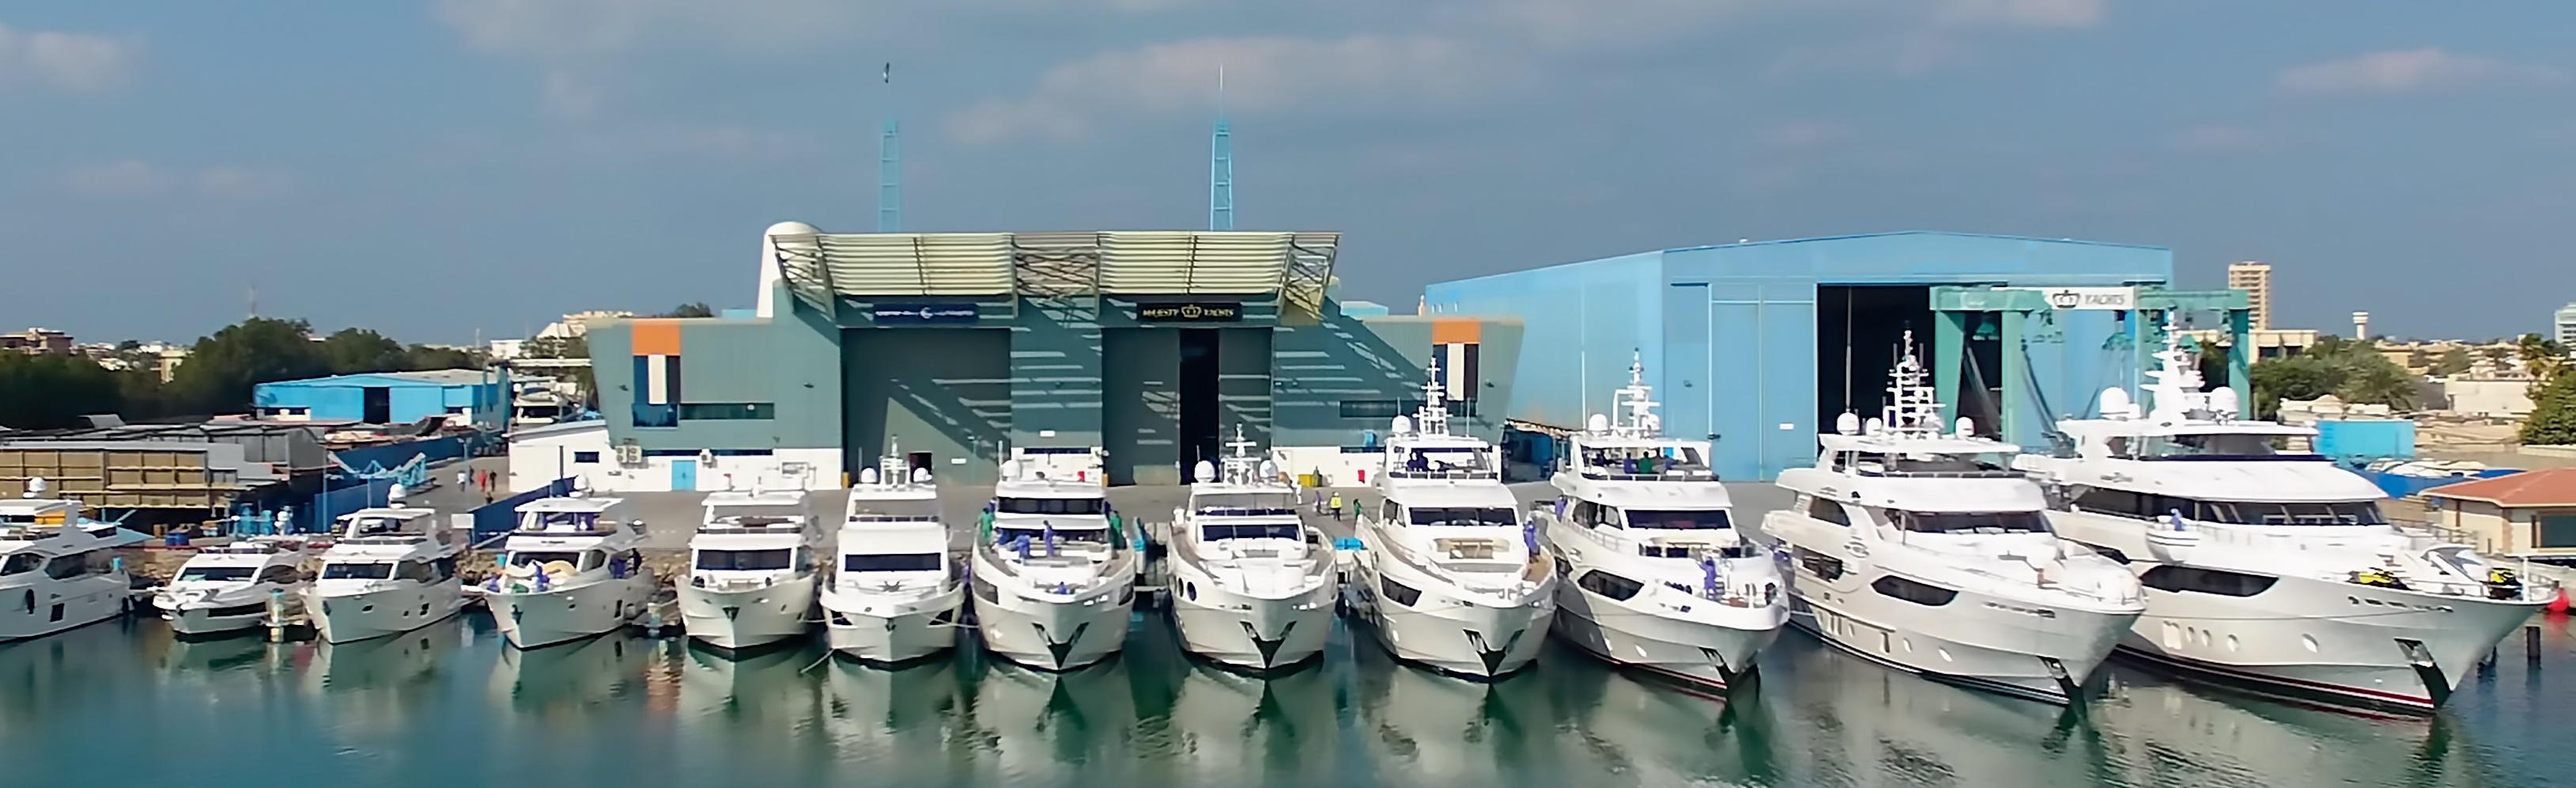 Gulf-Craft-fleet.jpg